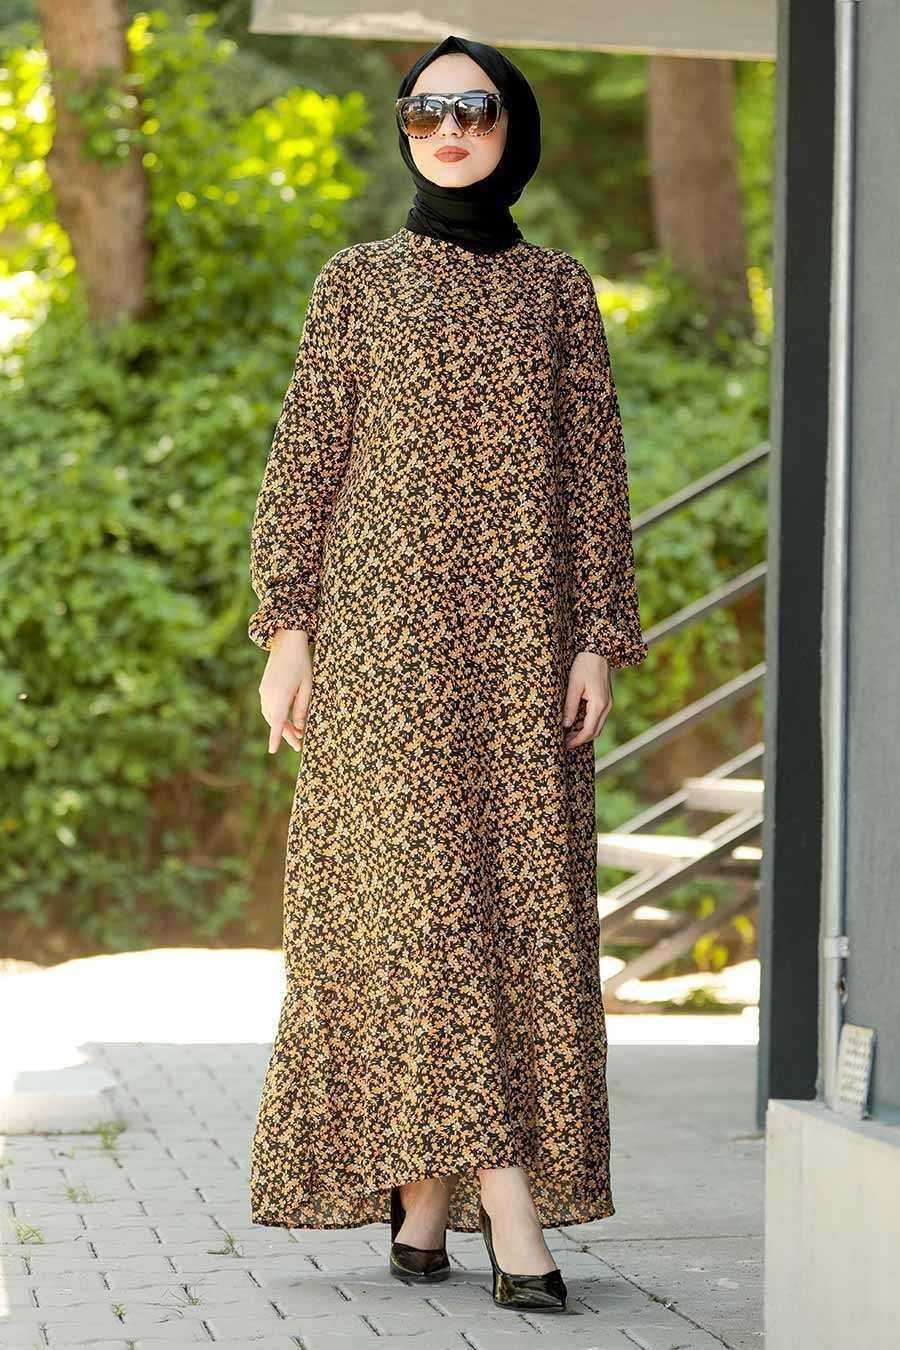 Neva Style Tesettür Desenli Viskon Elbise Modelleri